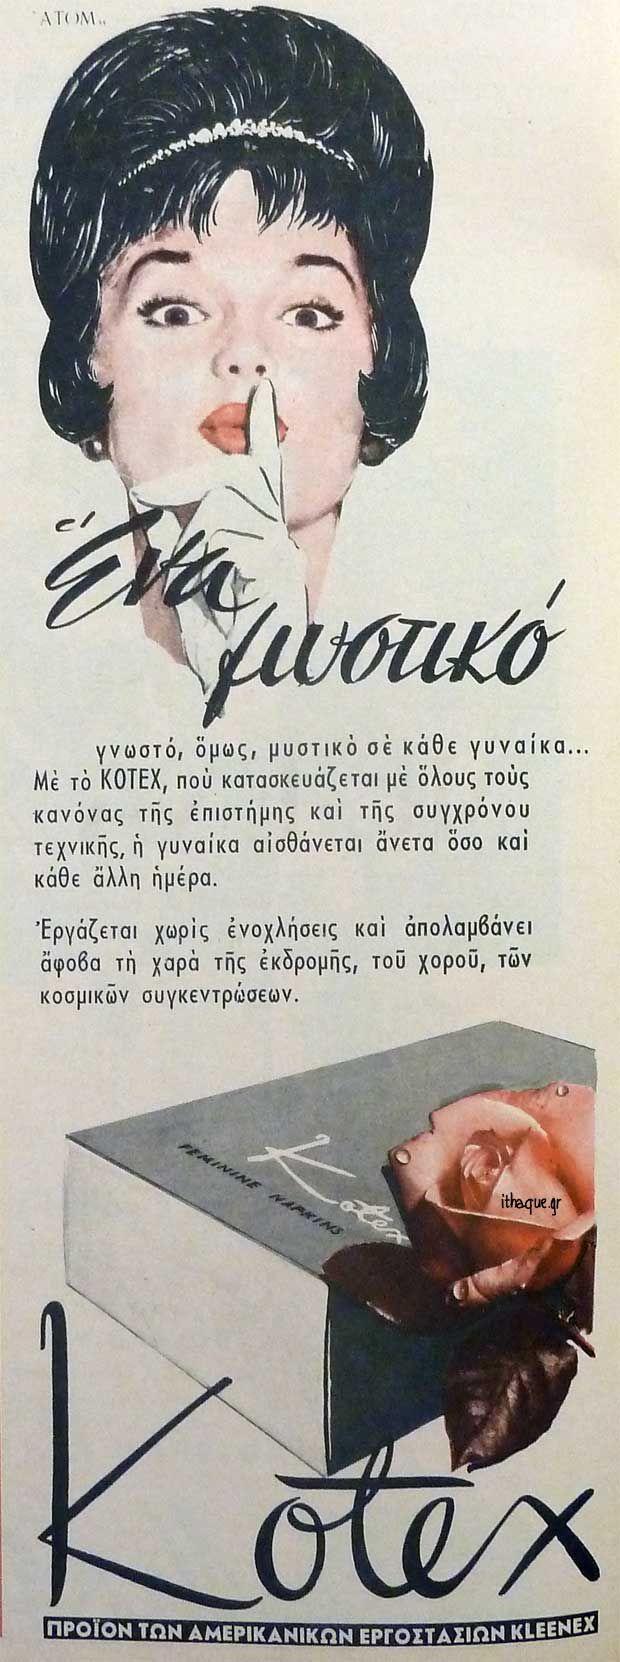 Kotex - Feminine Napkins